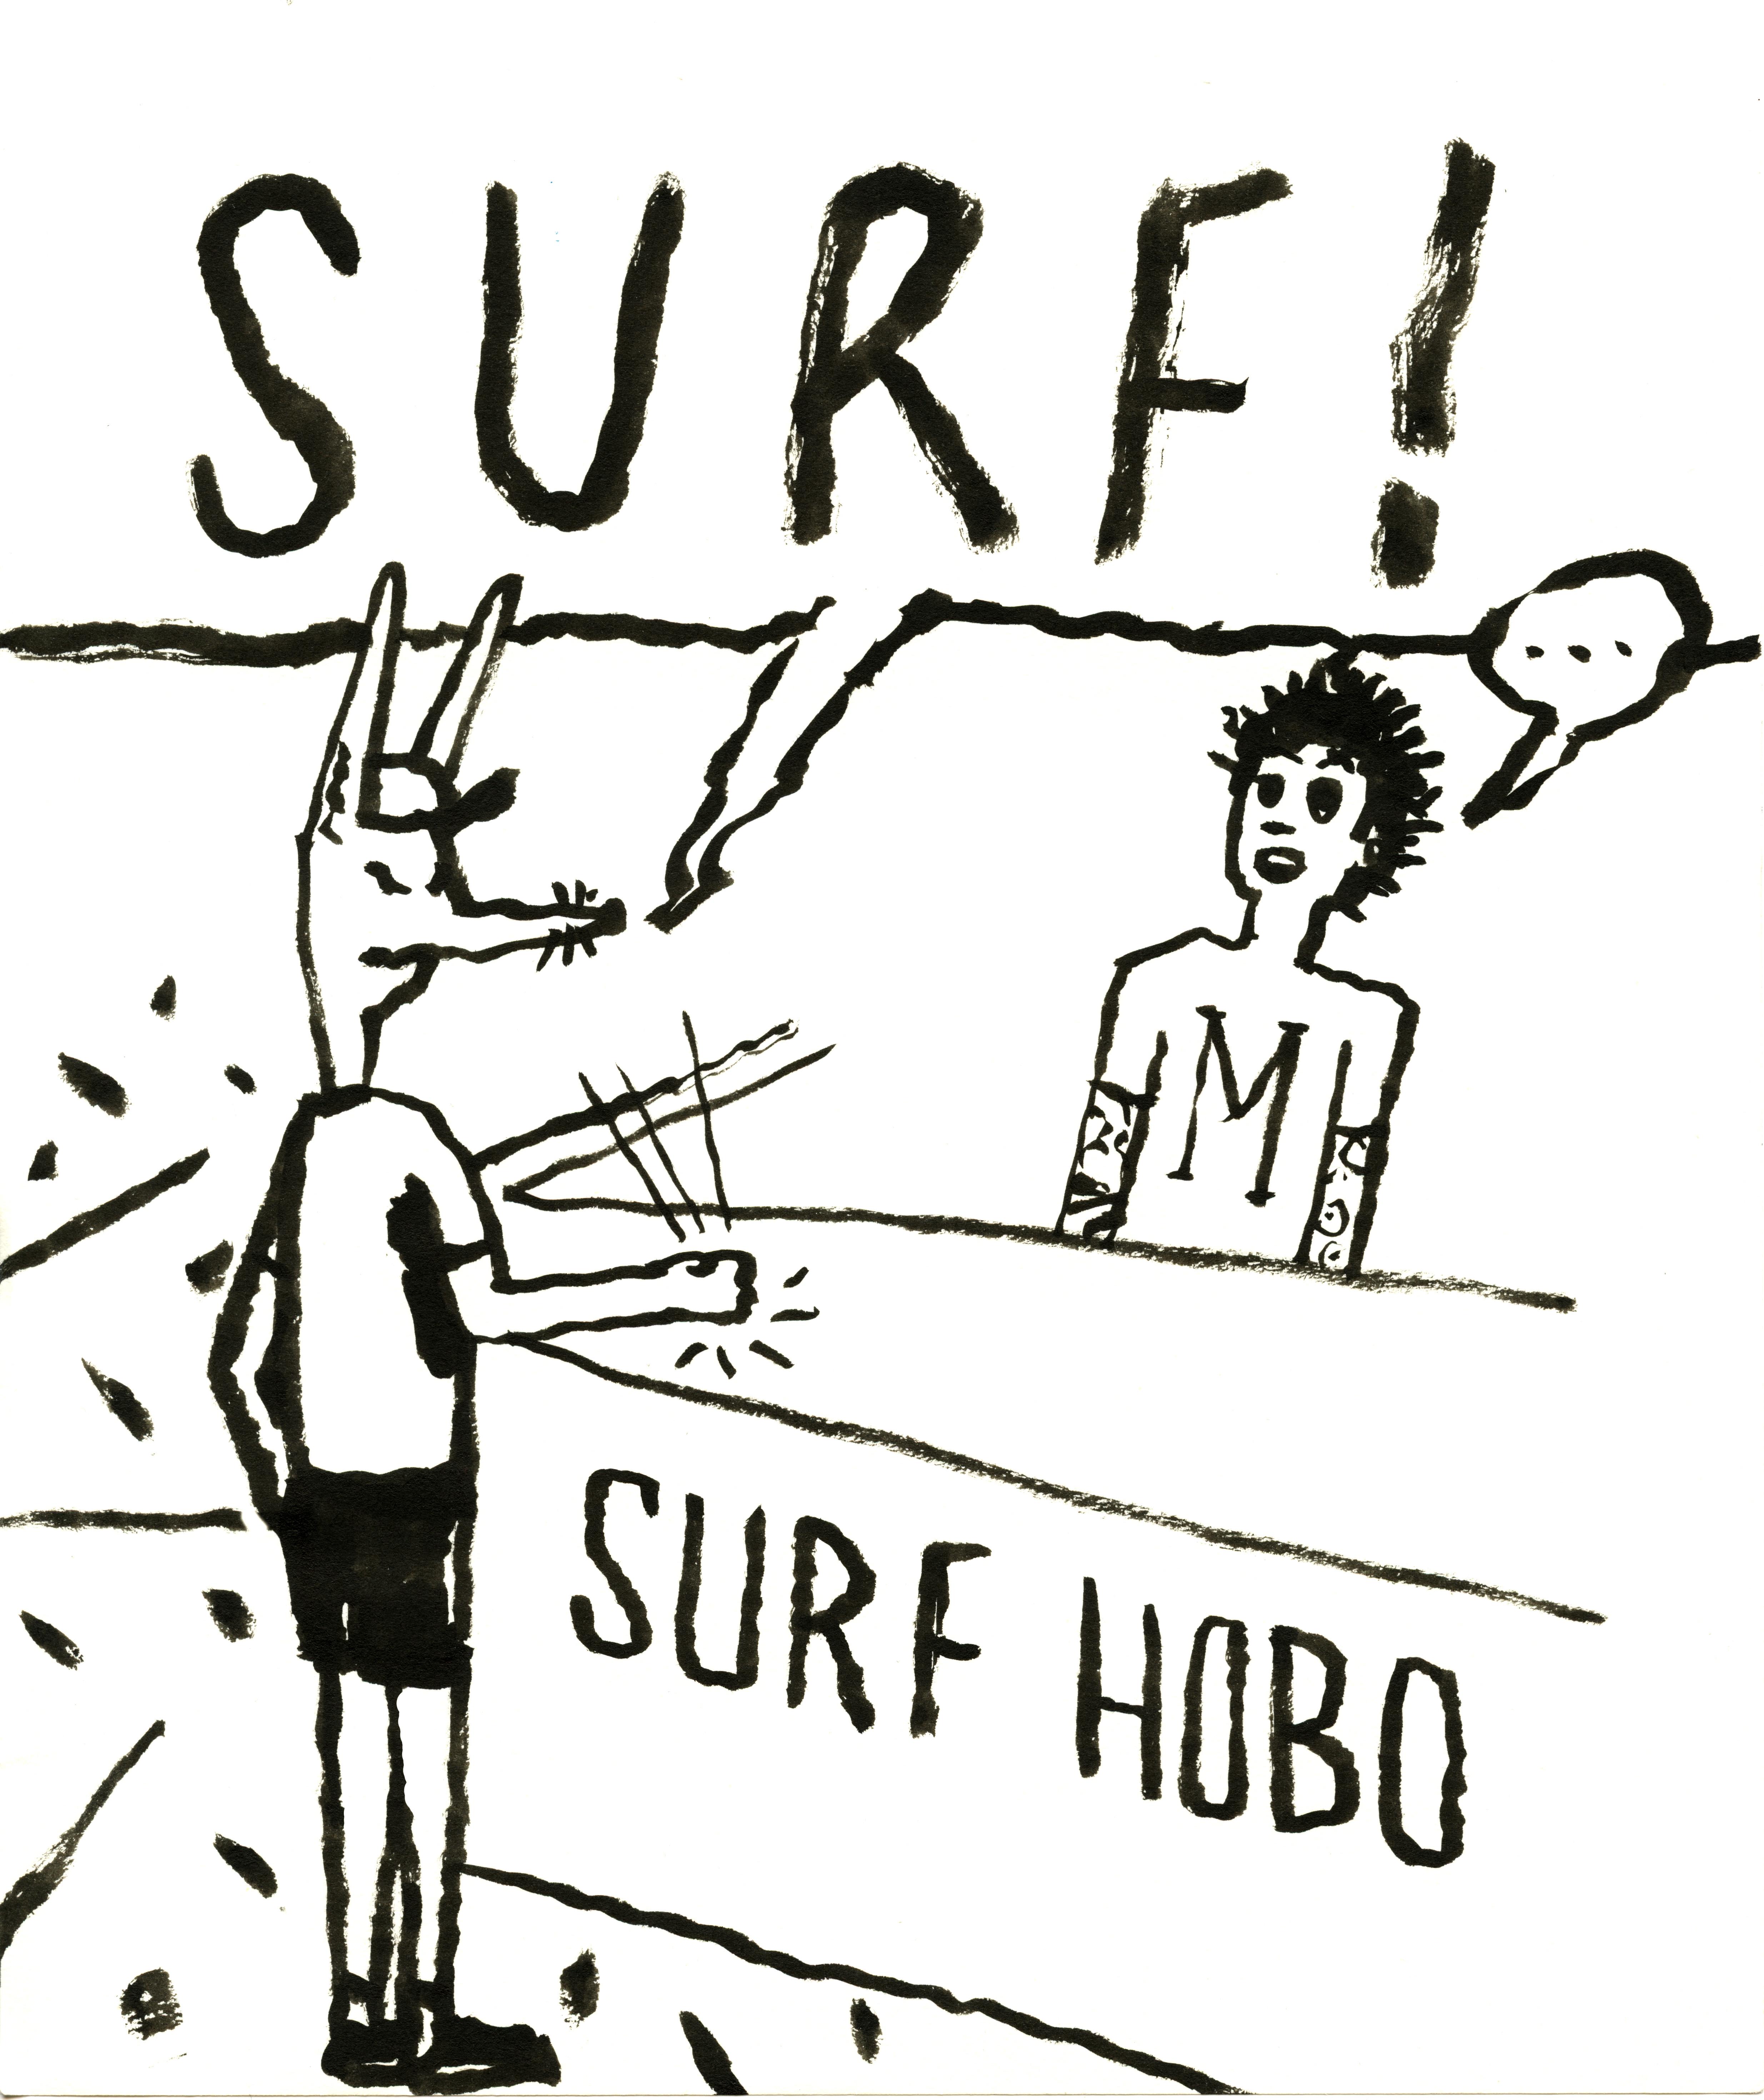 Hobo Surf_Now